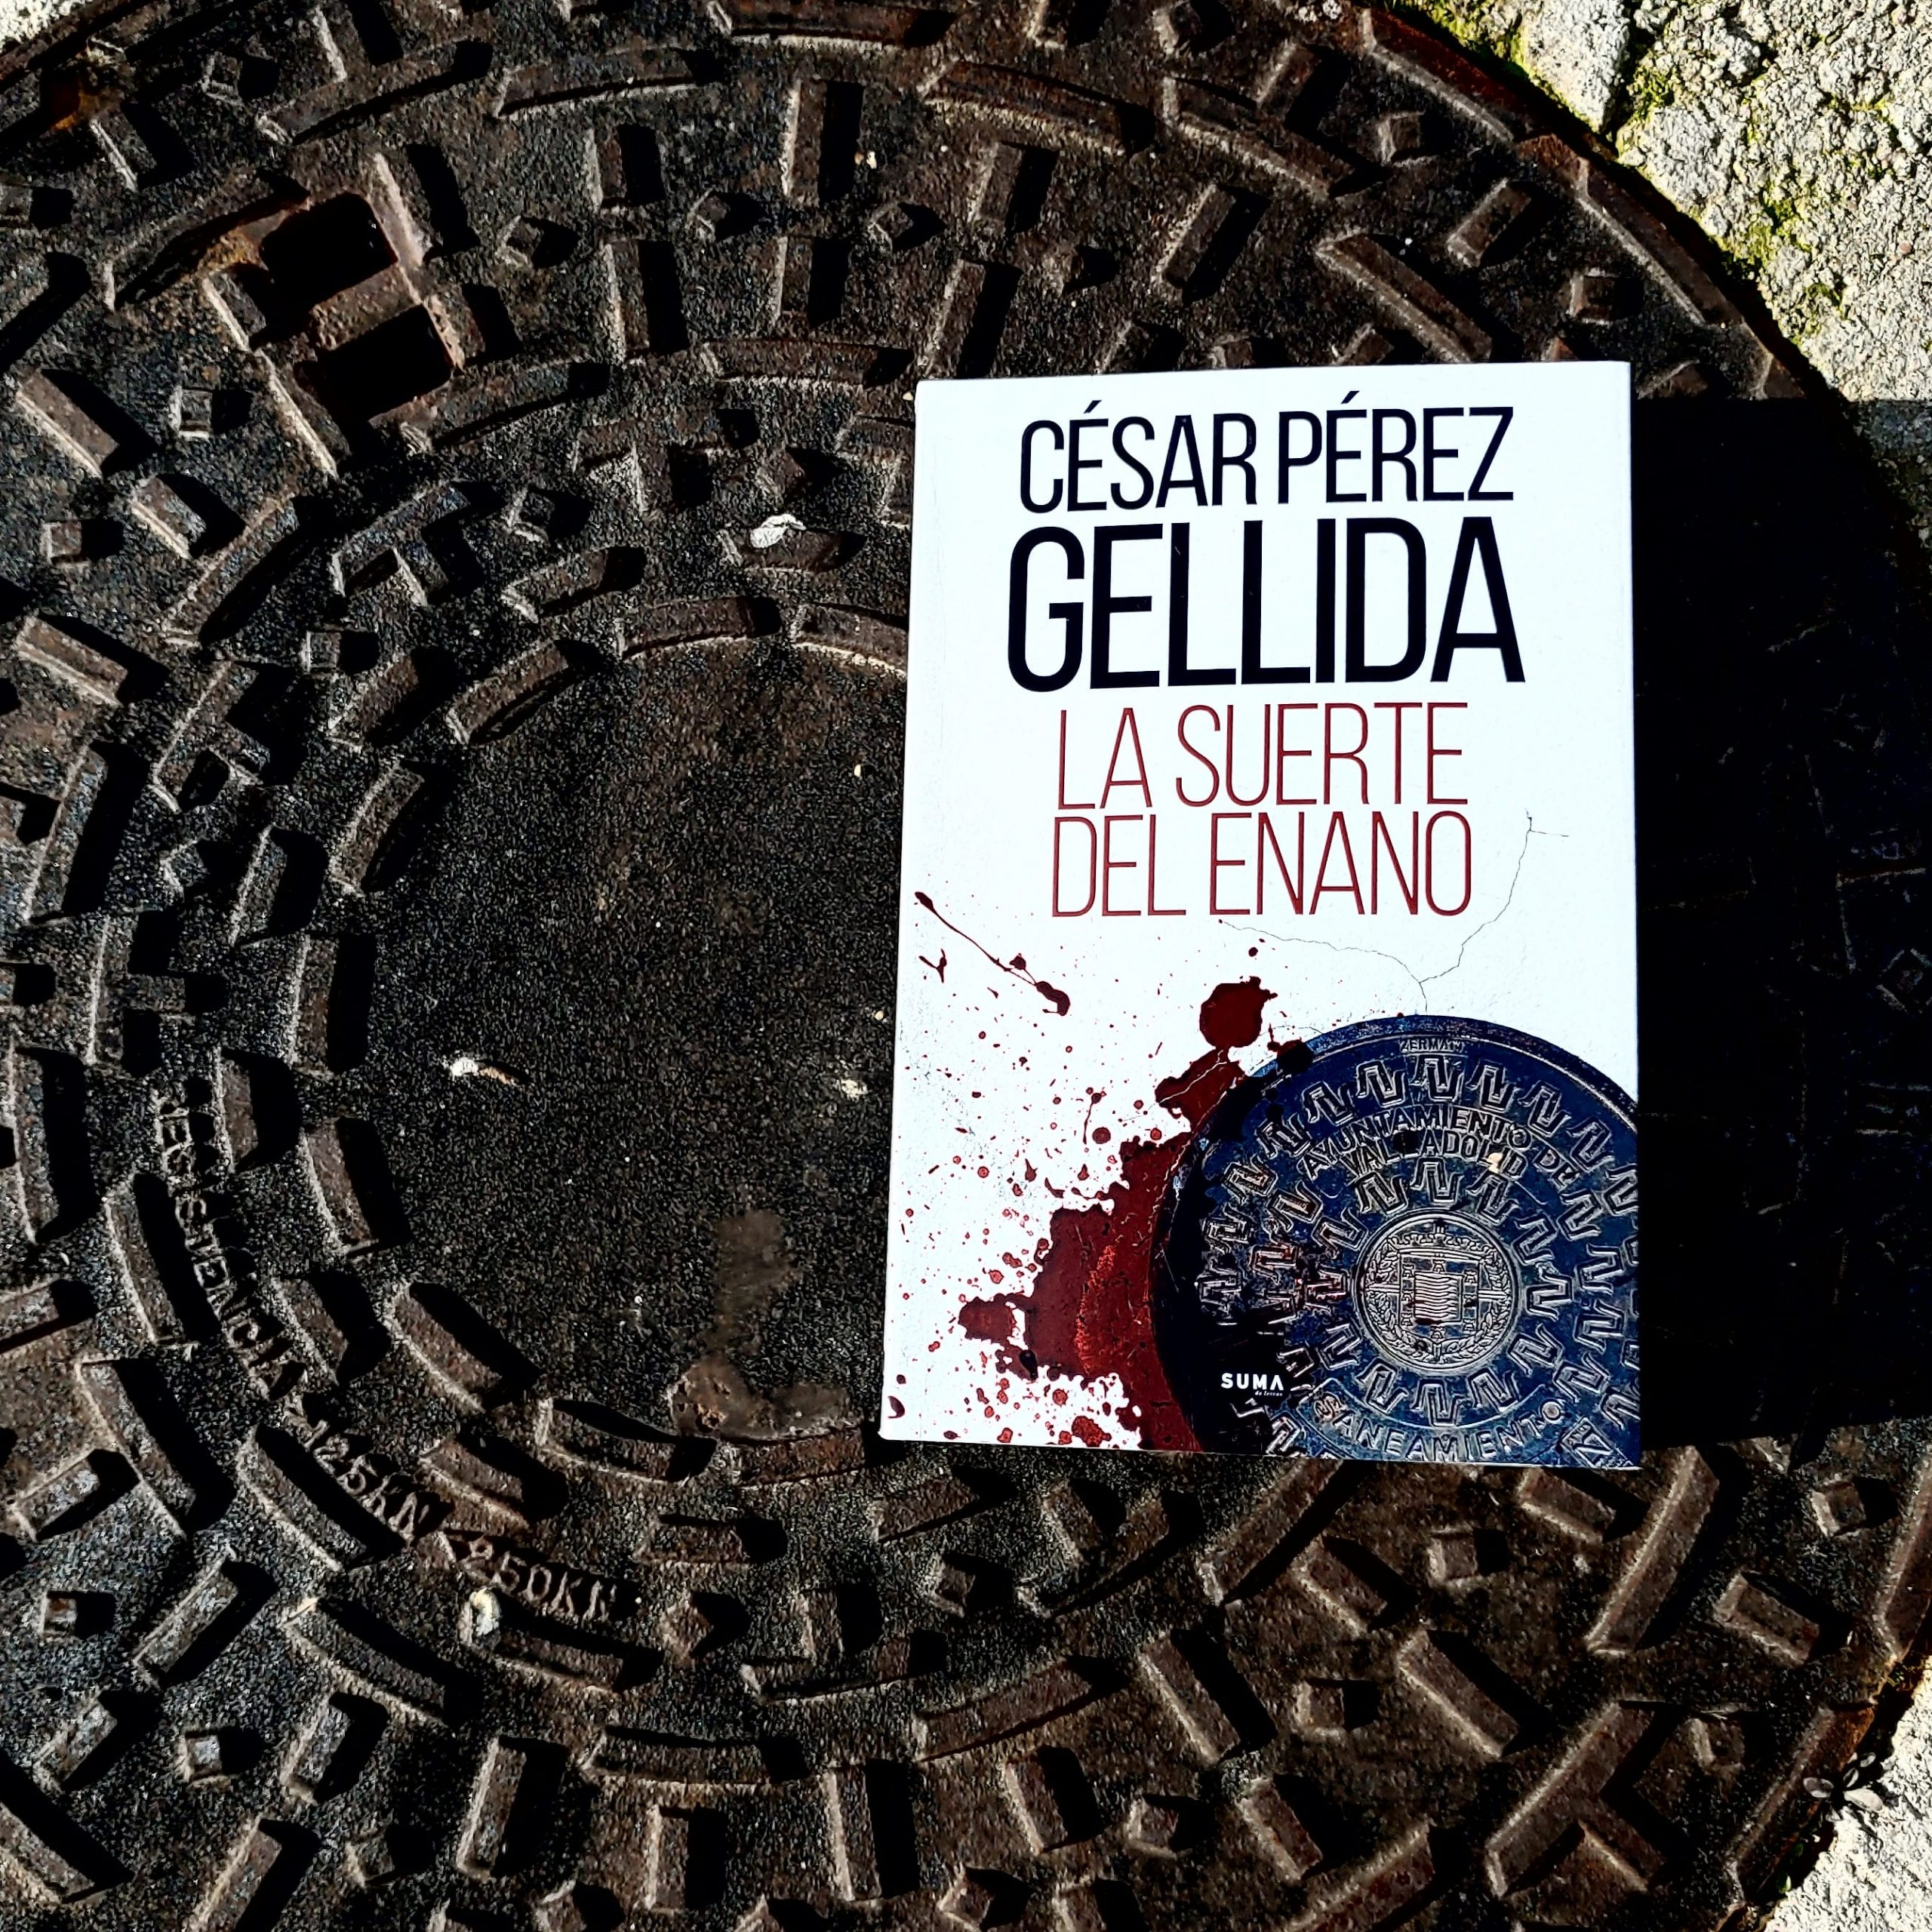 LA SUERTE DEL ENANO de CÉSAR PÉREZ GELLIDA.